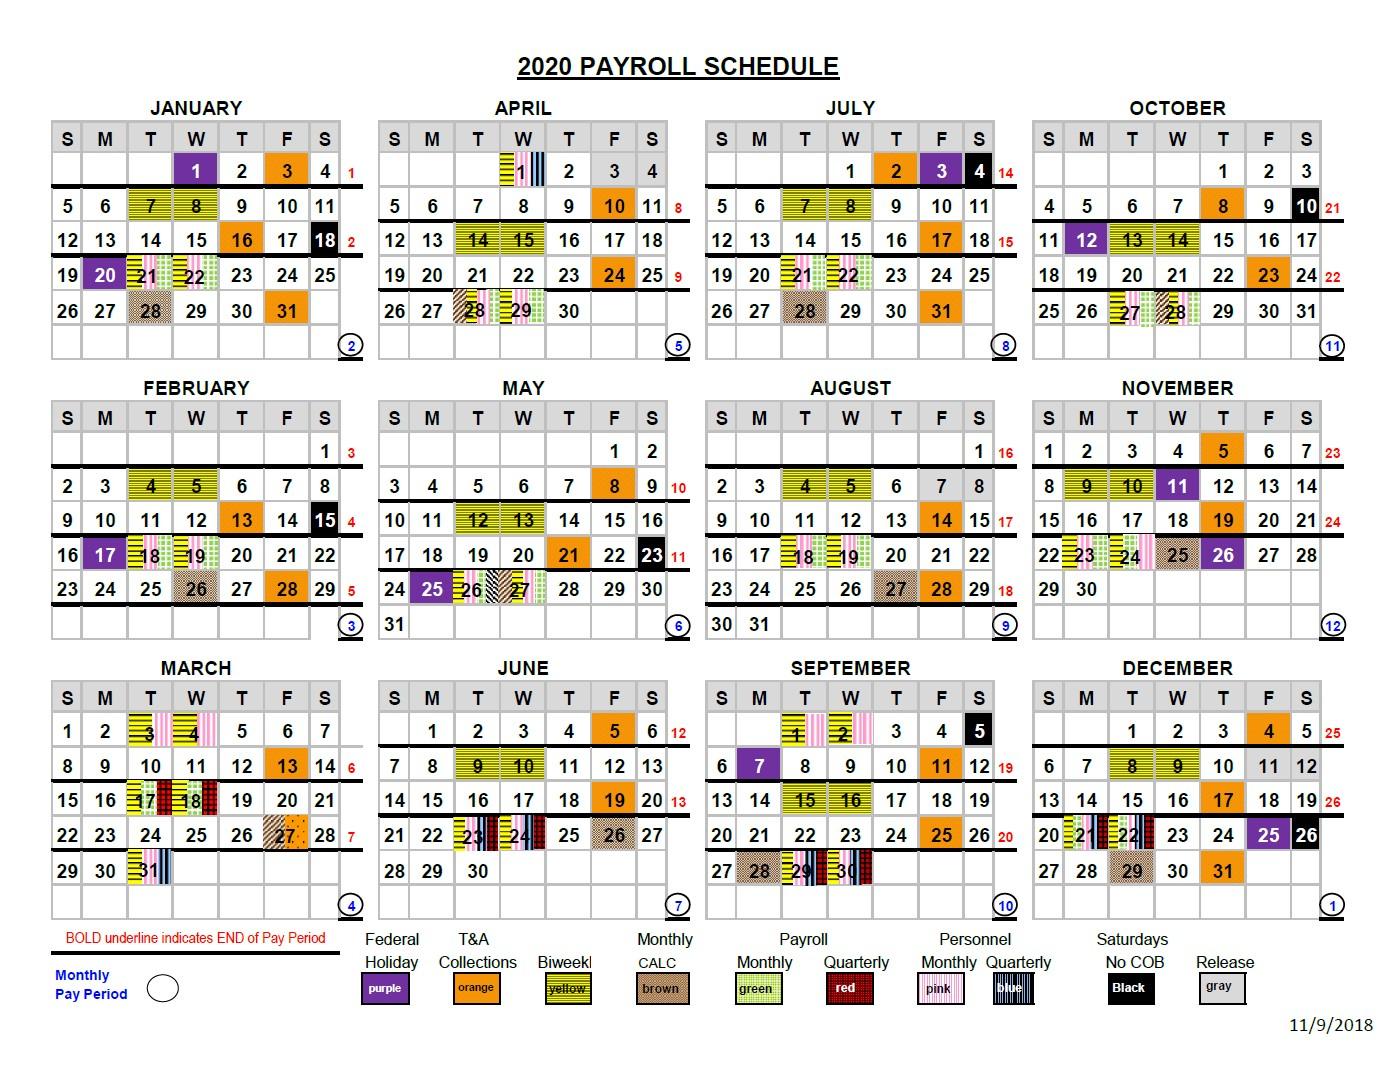 2020 Pay Period Calendar with regard to Uc Berkeley Payroll Calendar 2020